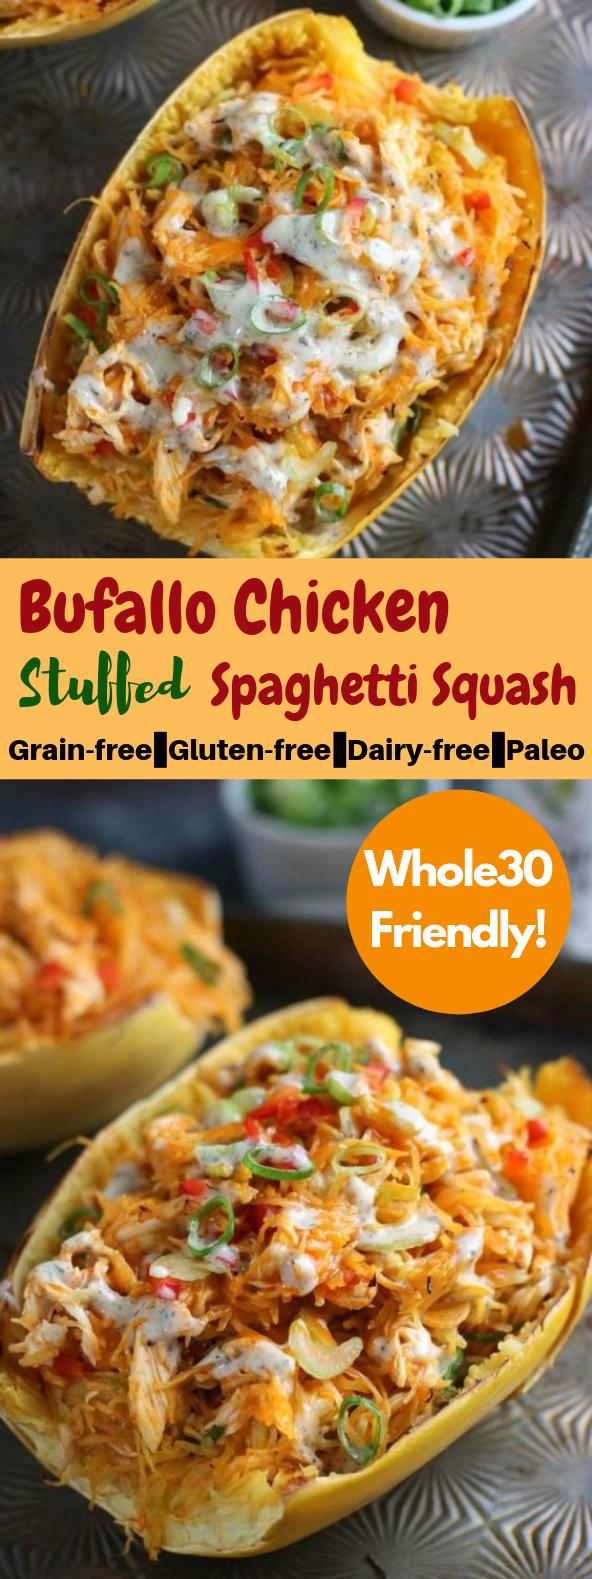 Buffalo Chicken Stuffed Spaghetti Squash #Chicken #HealthyRecipe